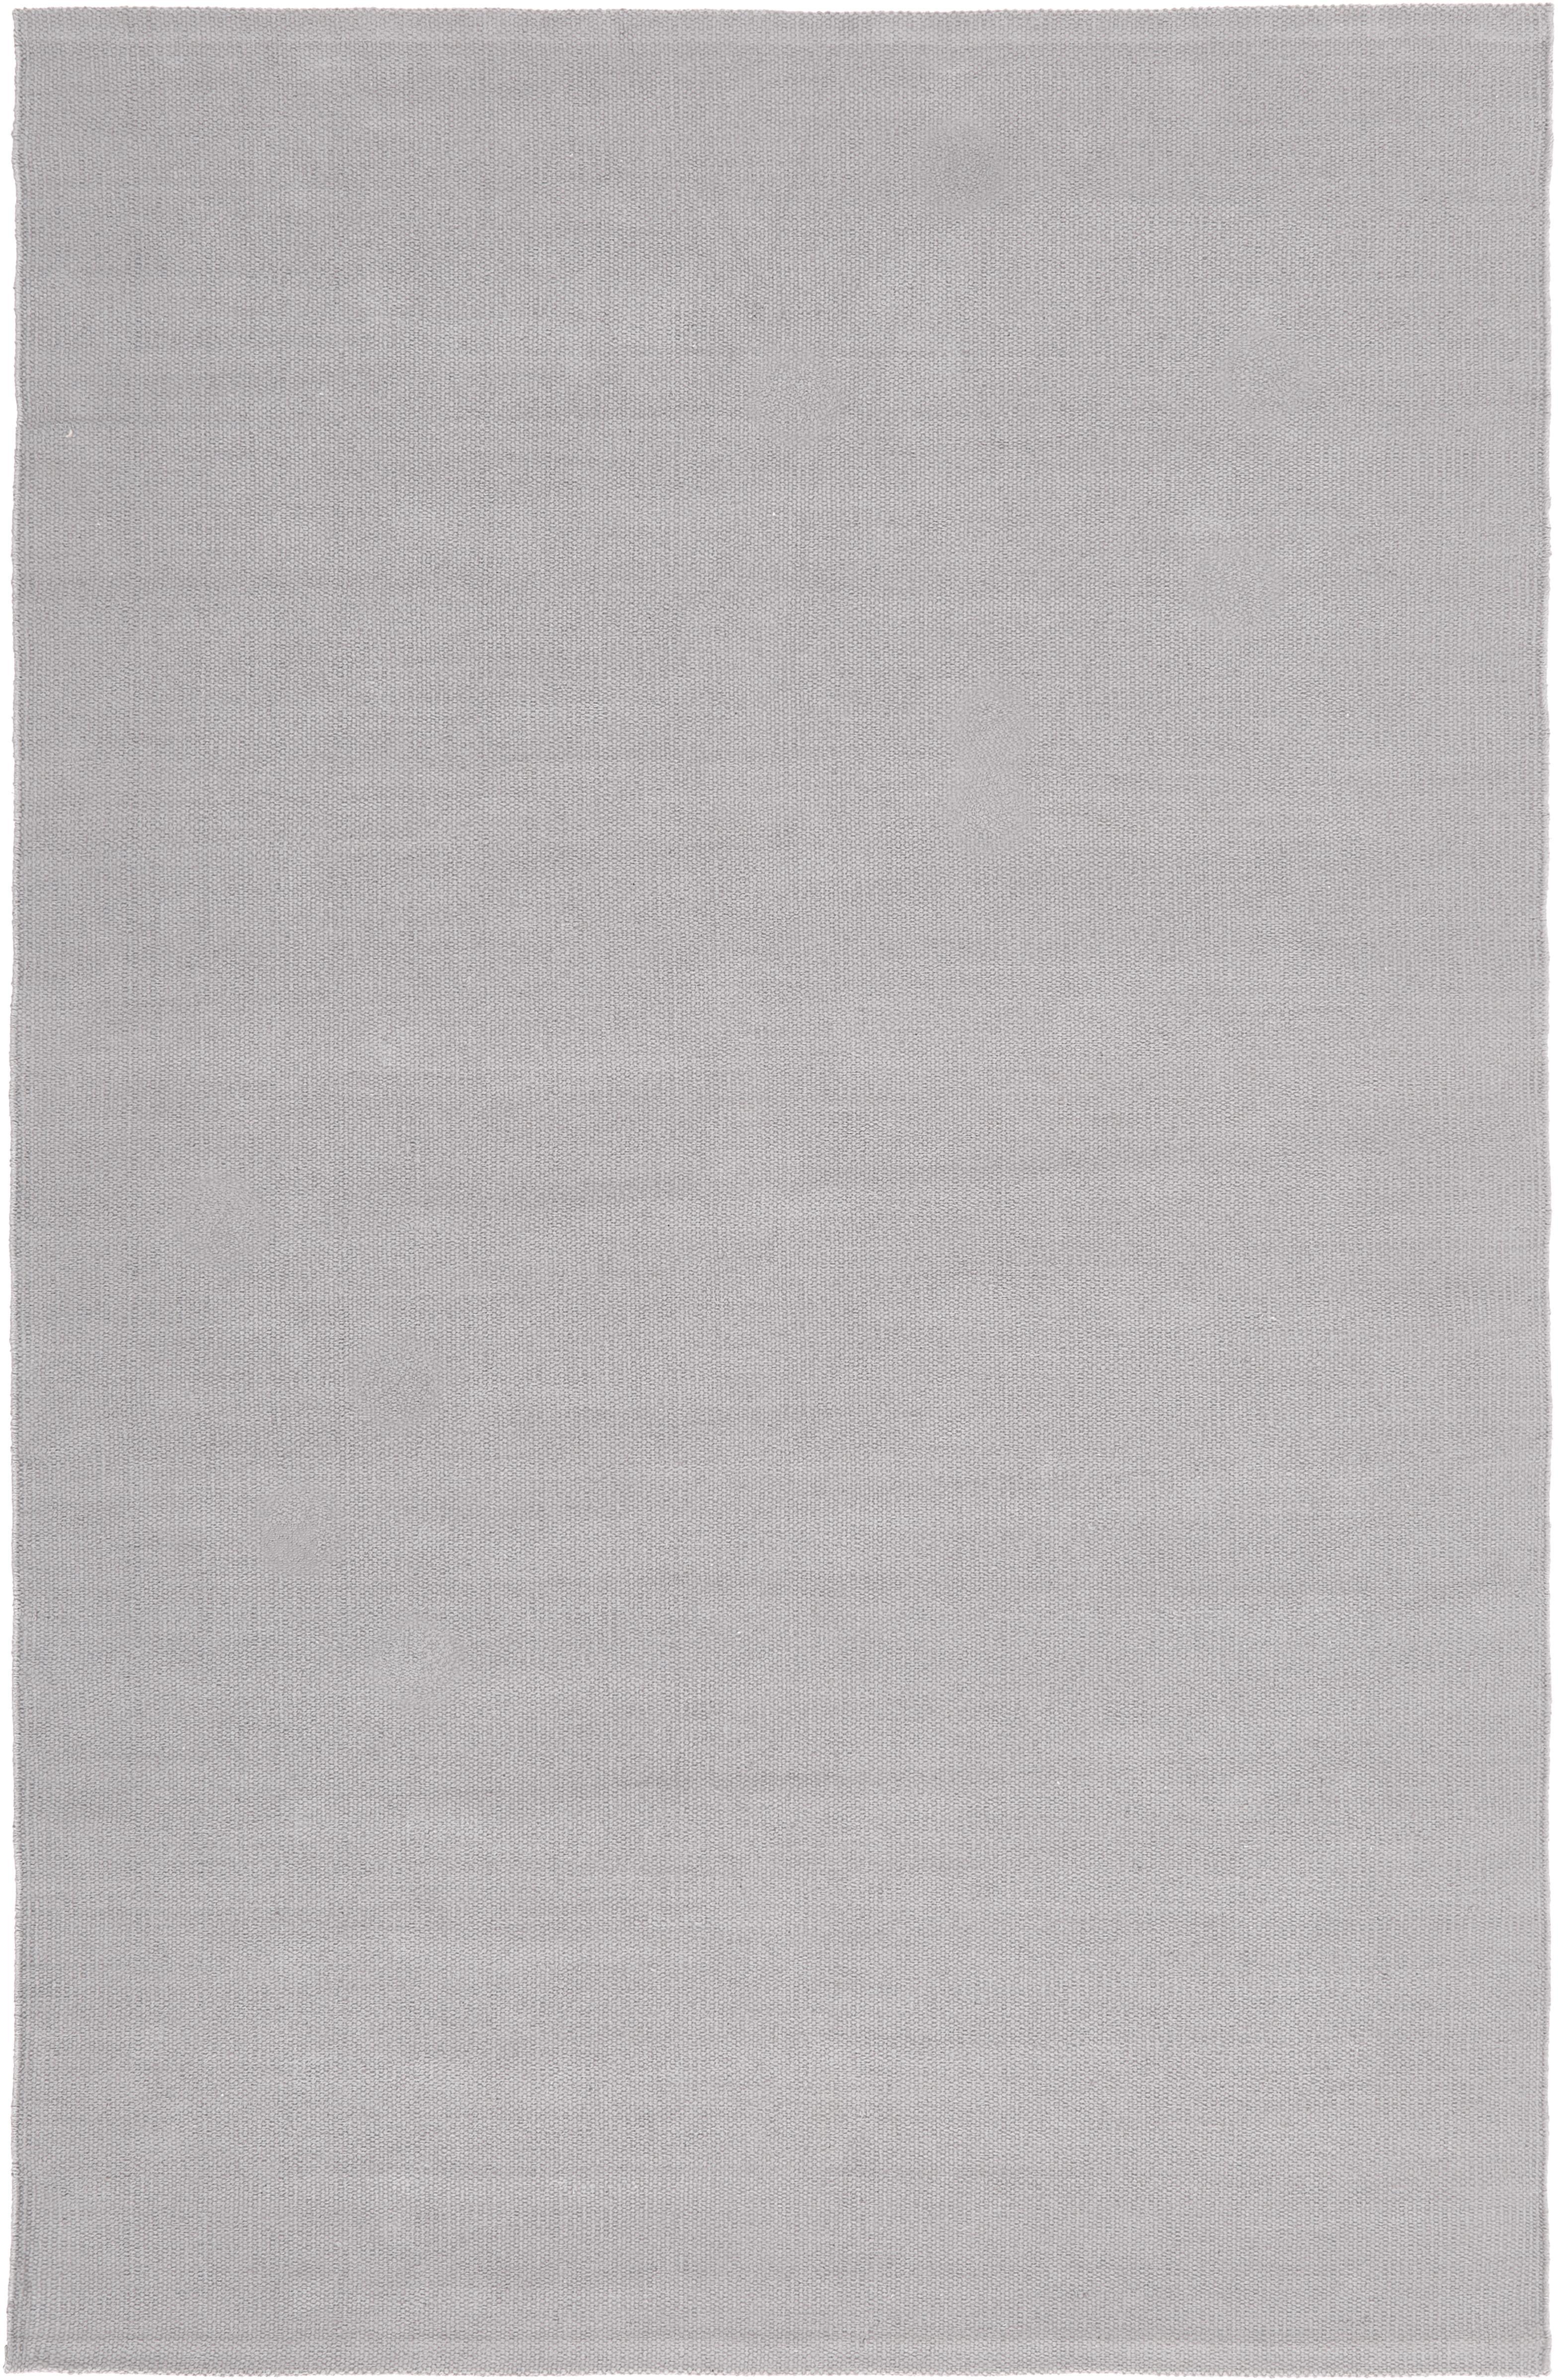 Dünner Baumwollteppich Agneta, handgewebt, 100% Baumwolle, Grau, B 120 x L 180 cm (Größe S)